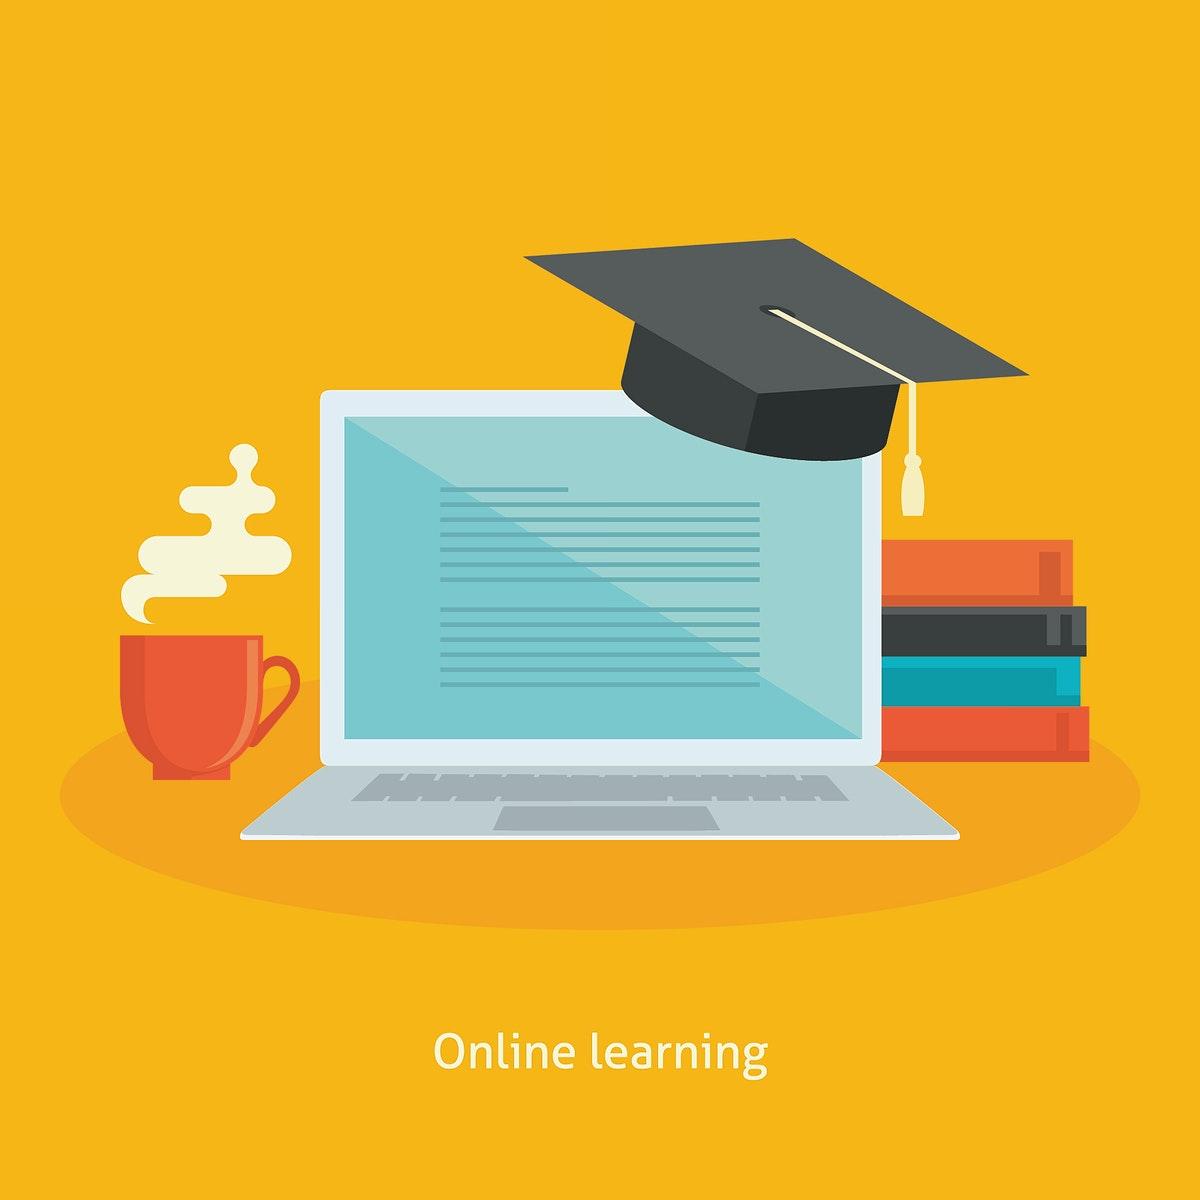 free online courses for https://d3njjcbhbojbot.cloudfront.net/api/utilities/v1/imageproxy/https://s3.amazonaws.com/coursera-course-photos/cb/3c4030d65011e682d8b14e2f0915fa/shutterstock_226881610.jpg?auto=format%2Ccom